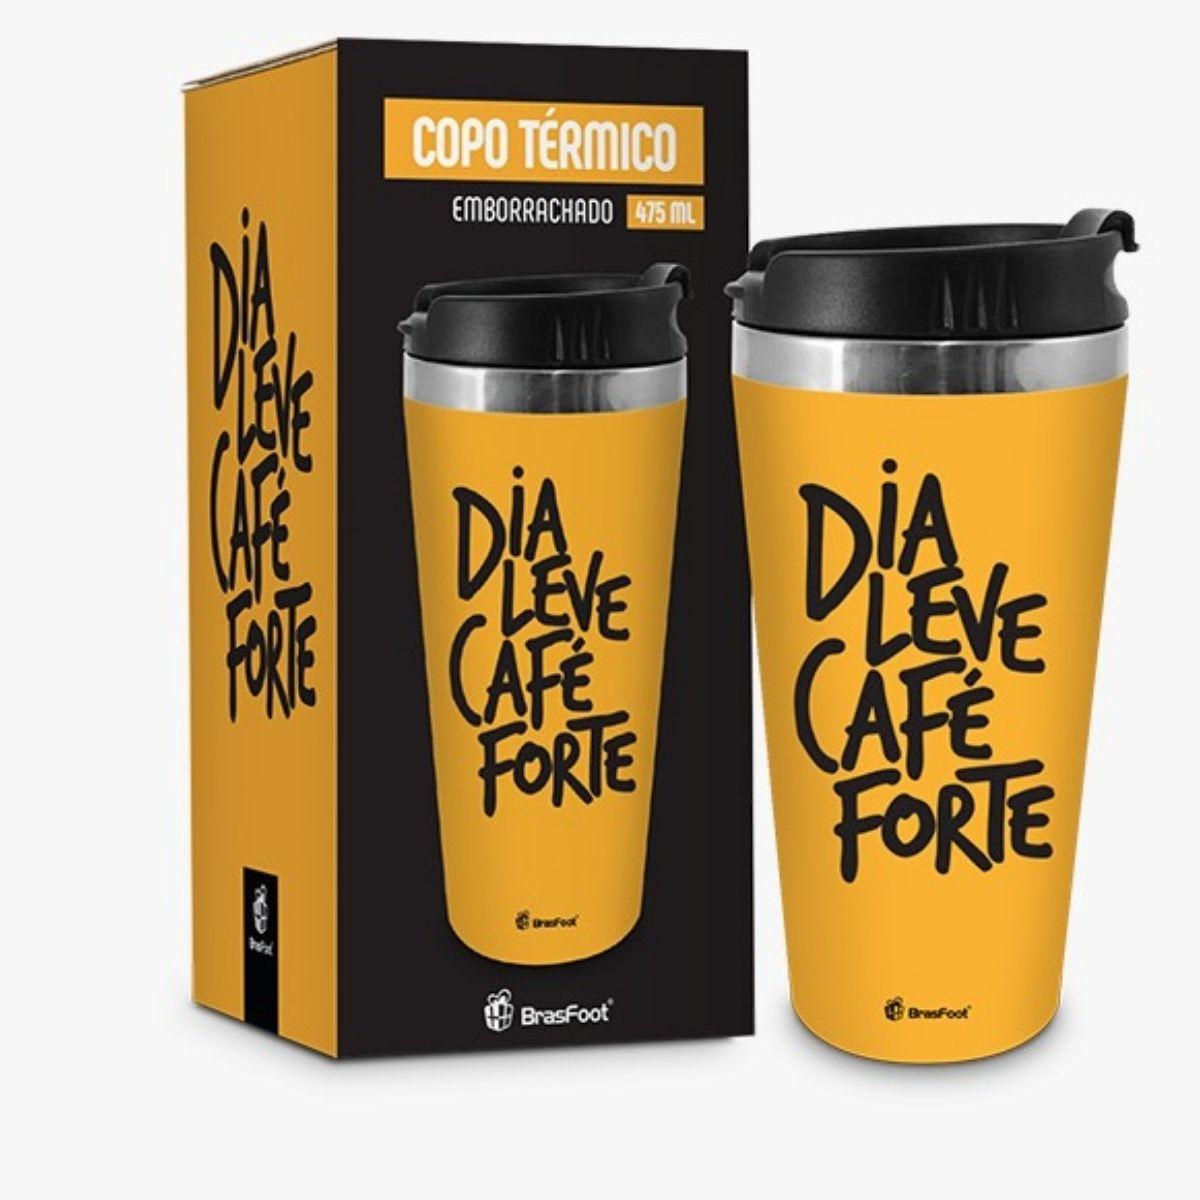 Copo Térmico Inox Emborrachado Dia Leve Café Forte 450ml Brasfoot